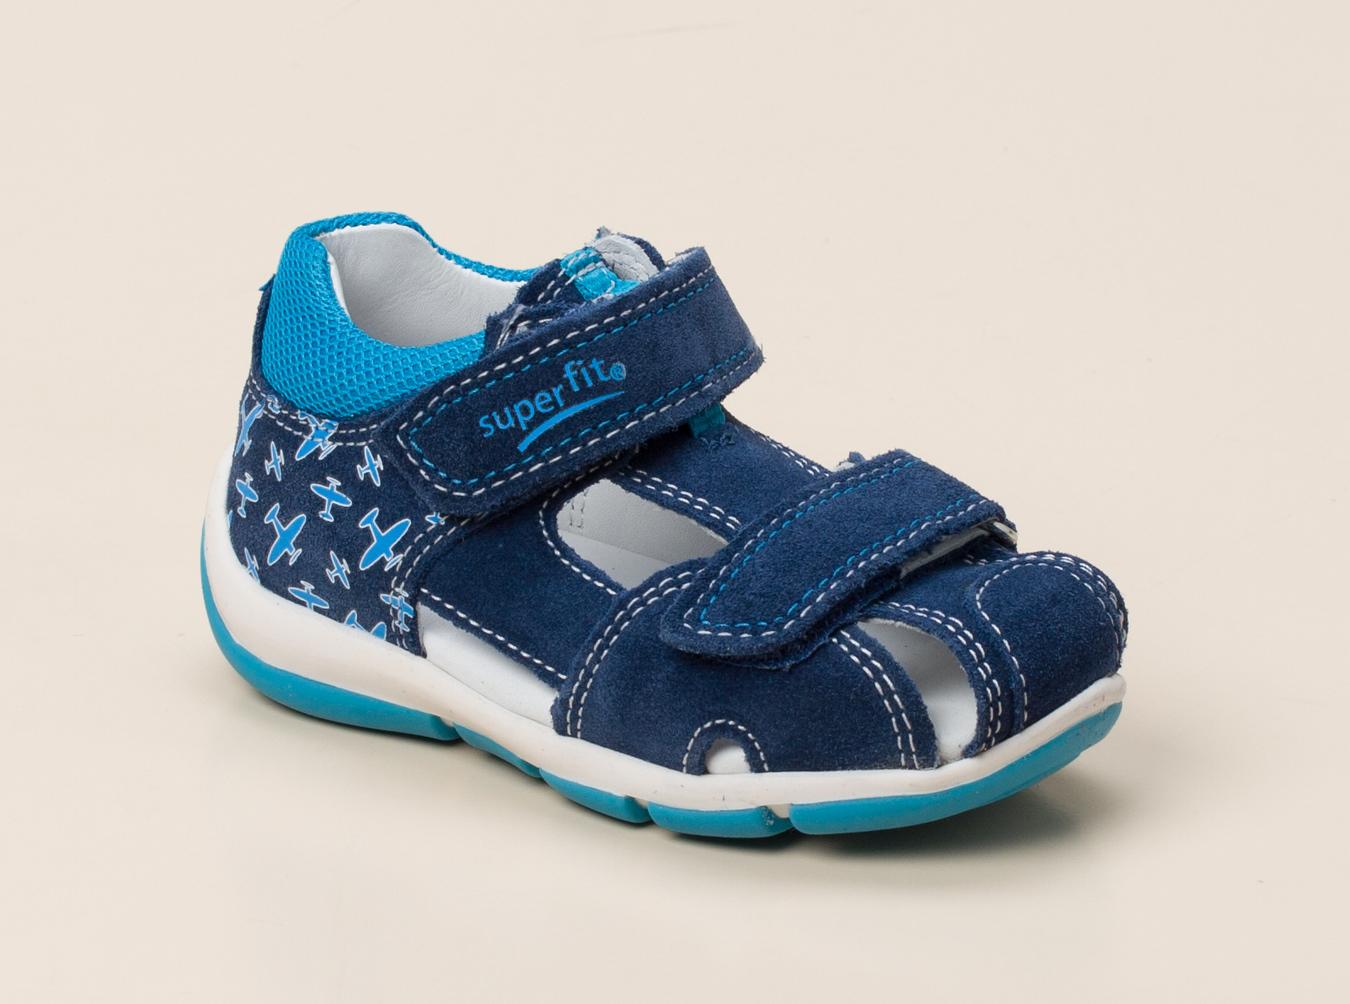 quality design b2f2c 3b1b6 Sandalette